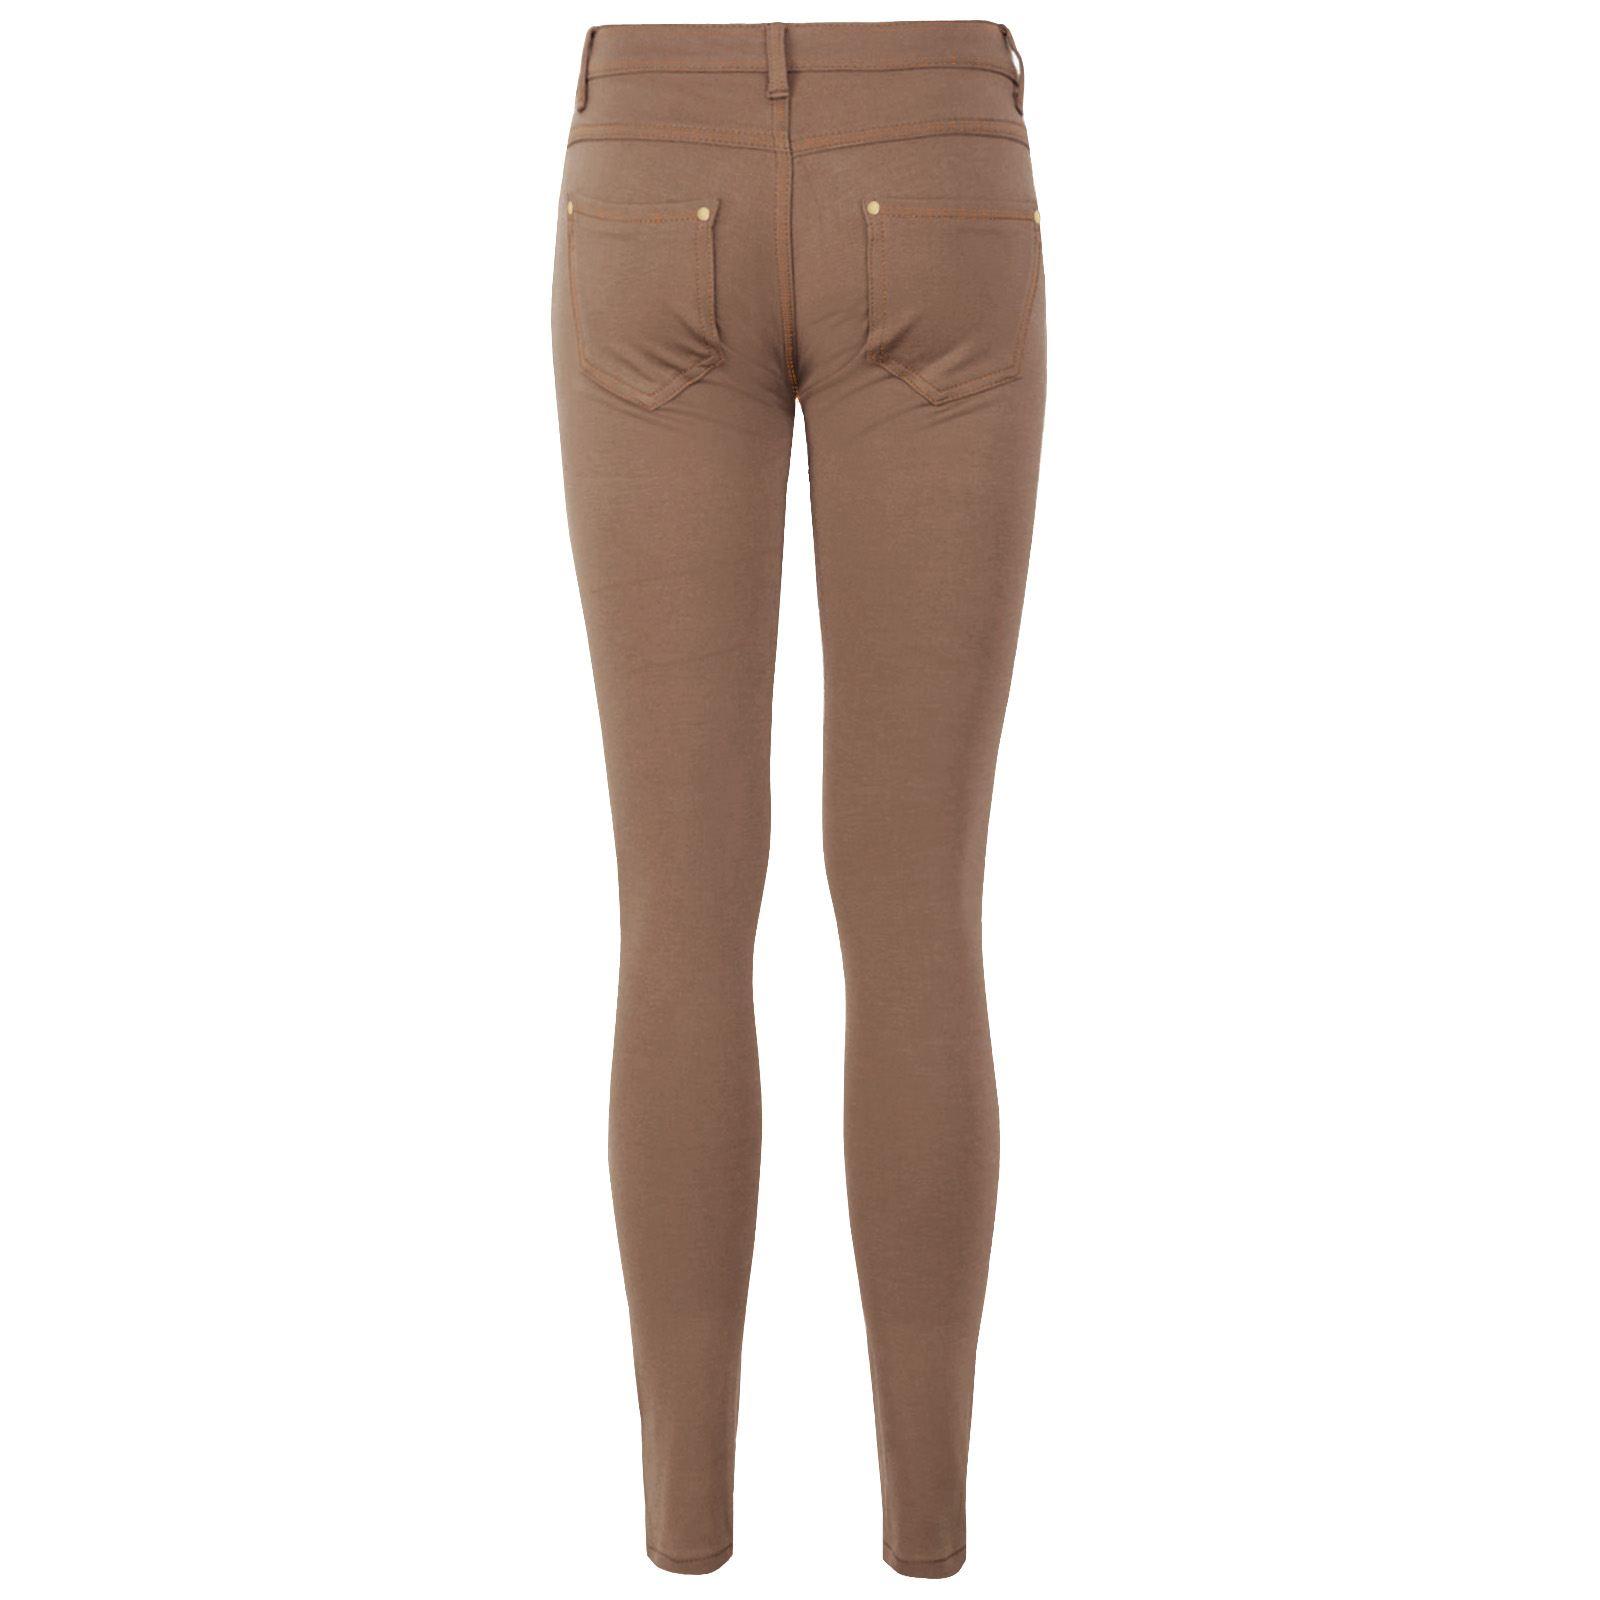 Jeans DONNA SKINNY Elasticizzato Jeggings Donna Fit Colorato Pantaloni Pantaloni Slim